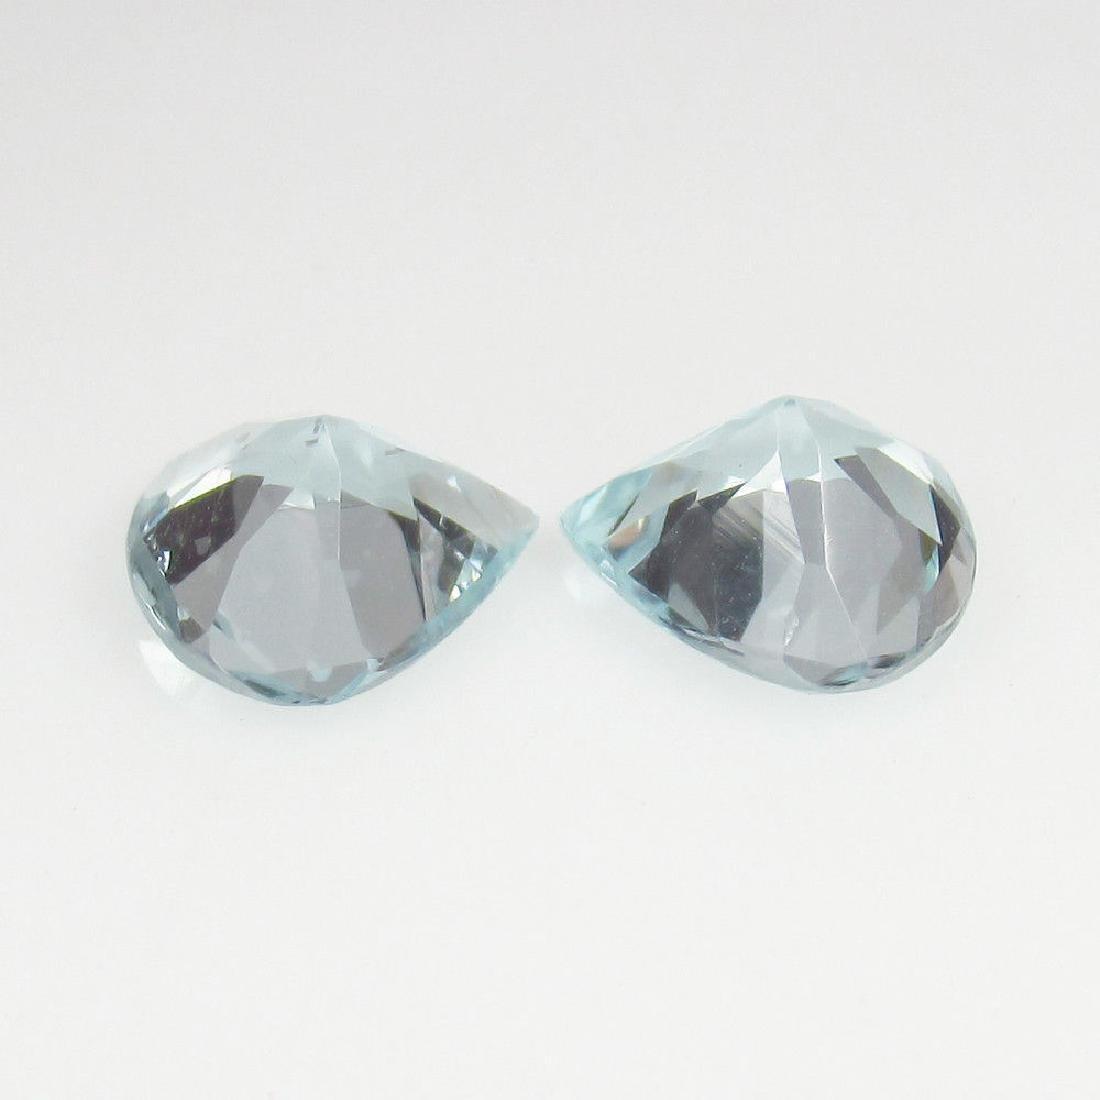 2.46 Ctw Natural Loose Matching Heart cut Aquamarine - 2